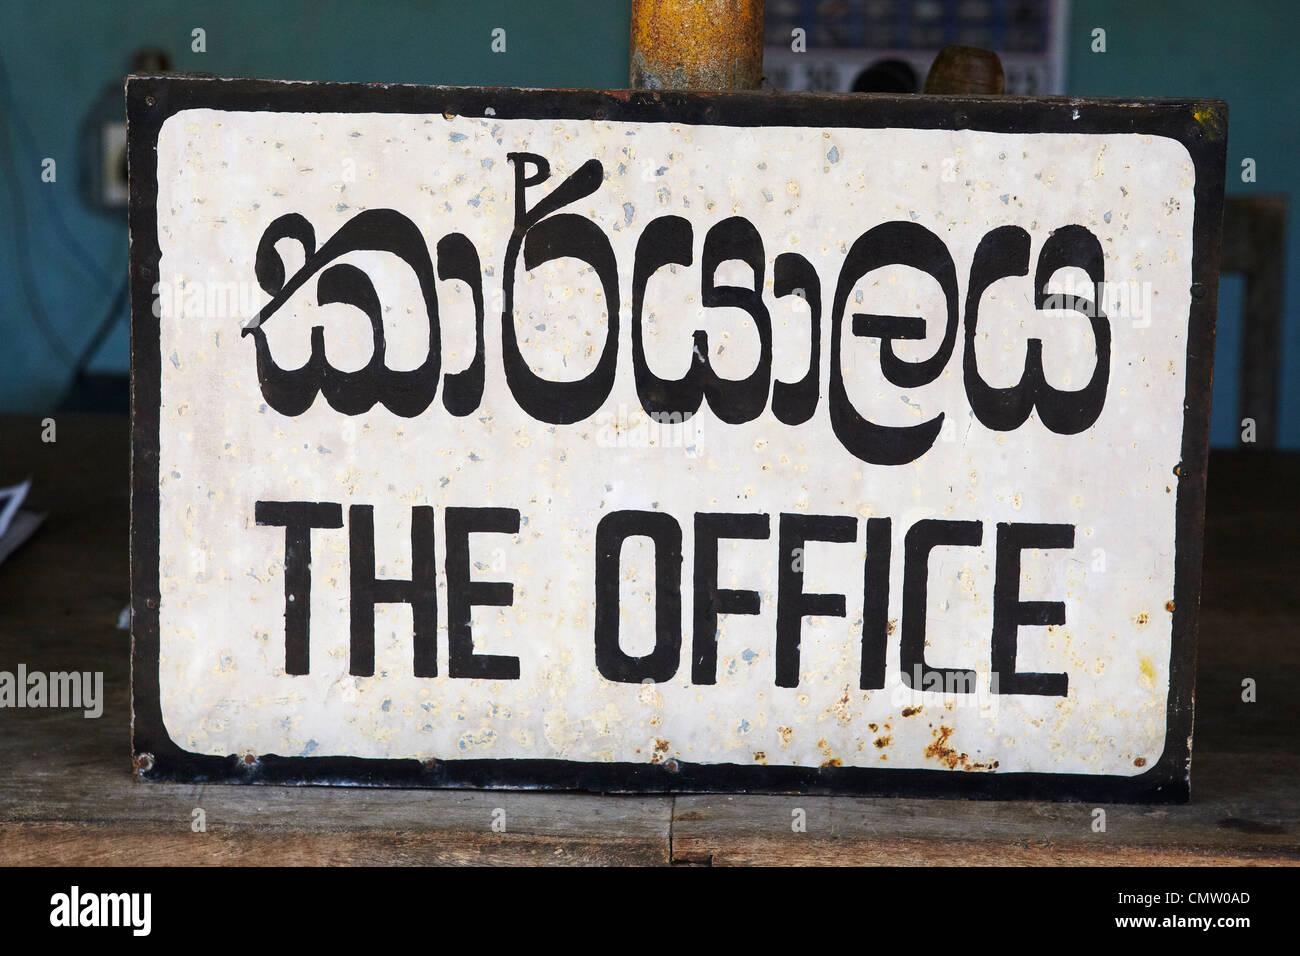 Sri Lanka - Información de texto Letras letras letras idioma tamil Imagen De Stock